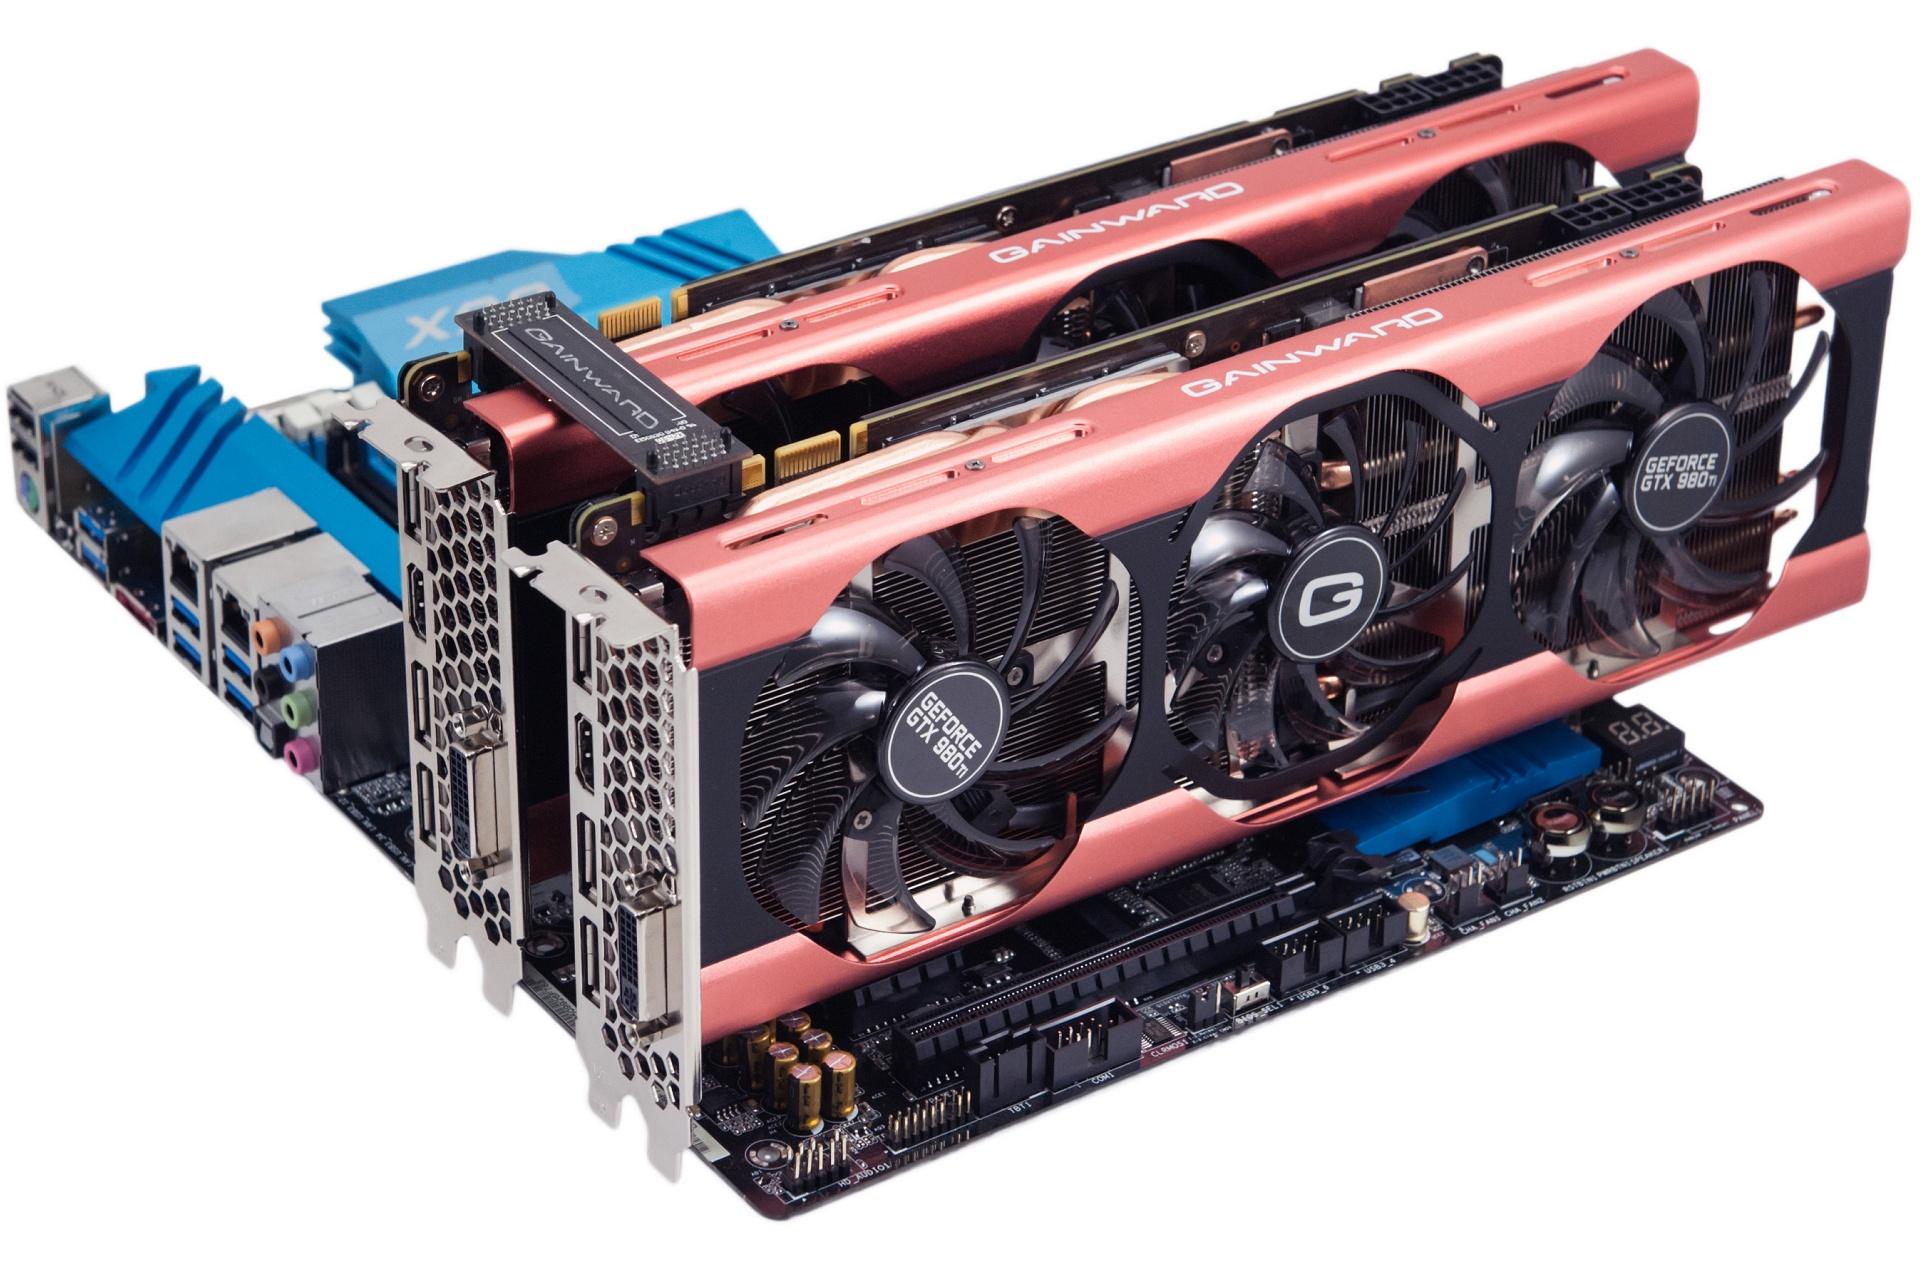 Geforce Gtx 980 Ti Sli Vs Radeon R9 Fury X Crossfire